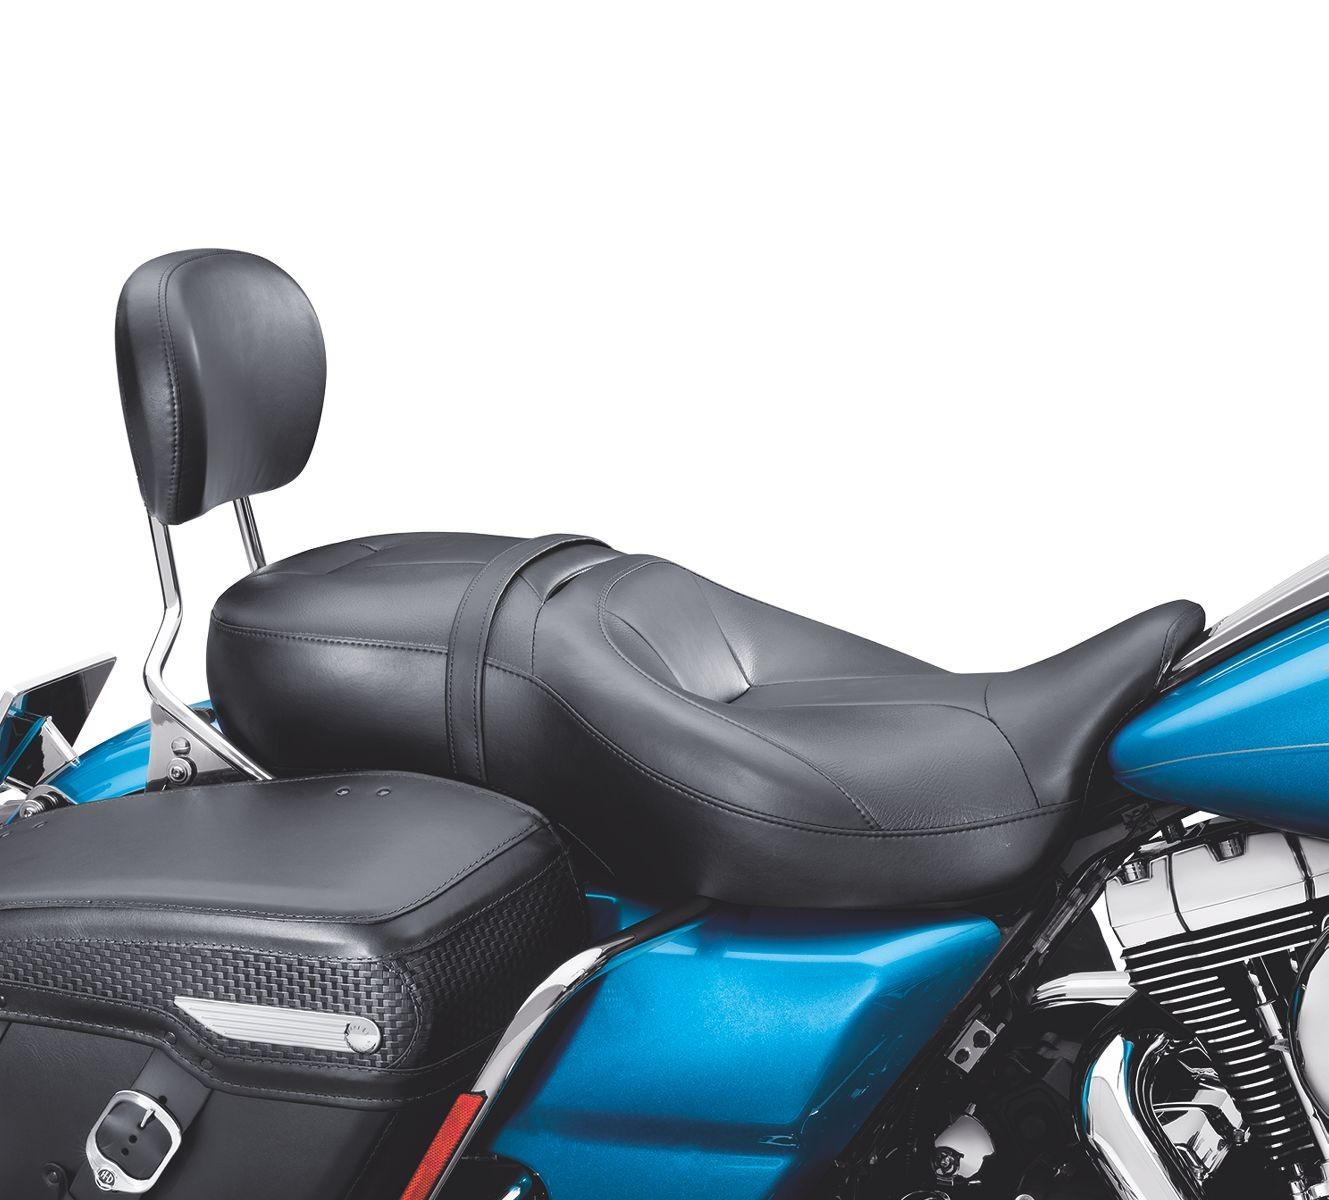 hight resolution of 52000004a harley davidson harley hammock heated rider and passenger touring seat chester harley davidson